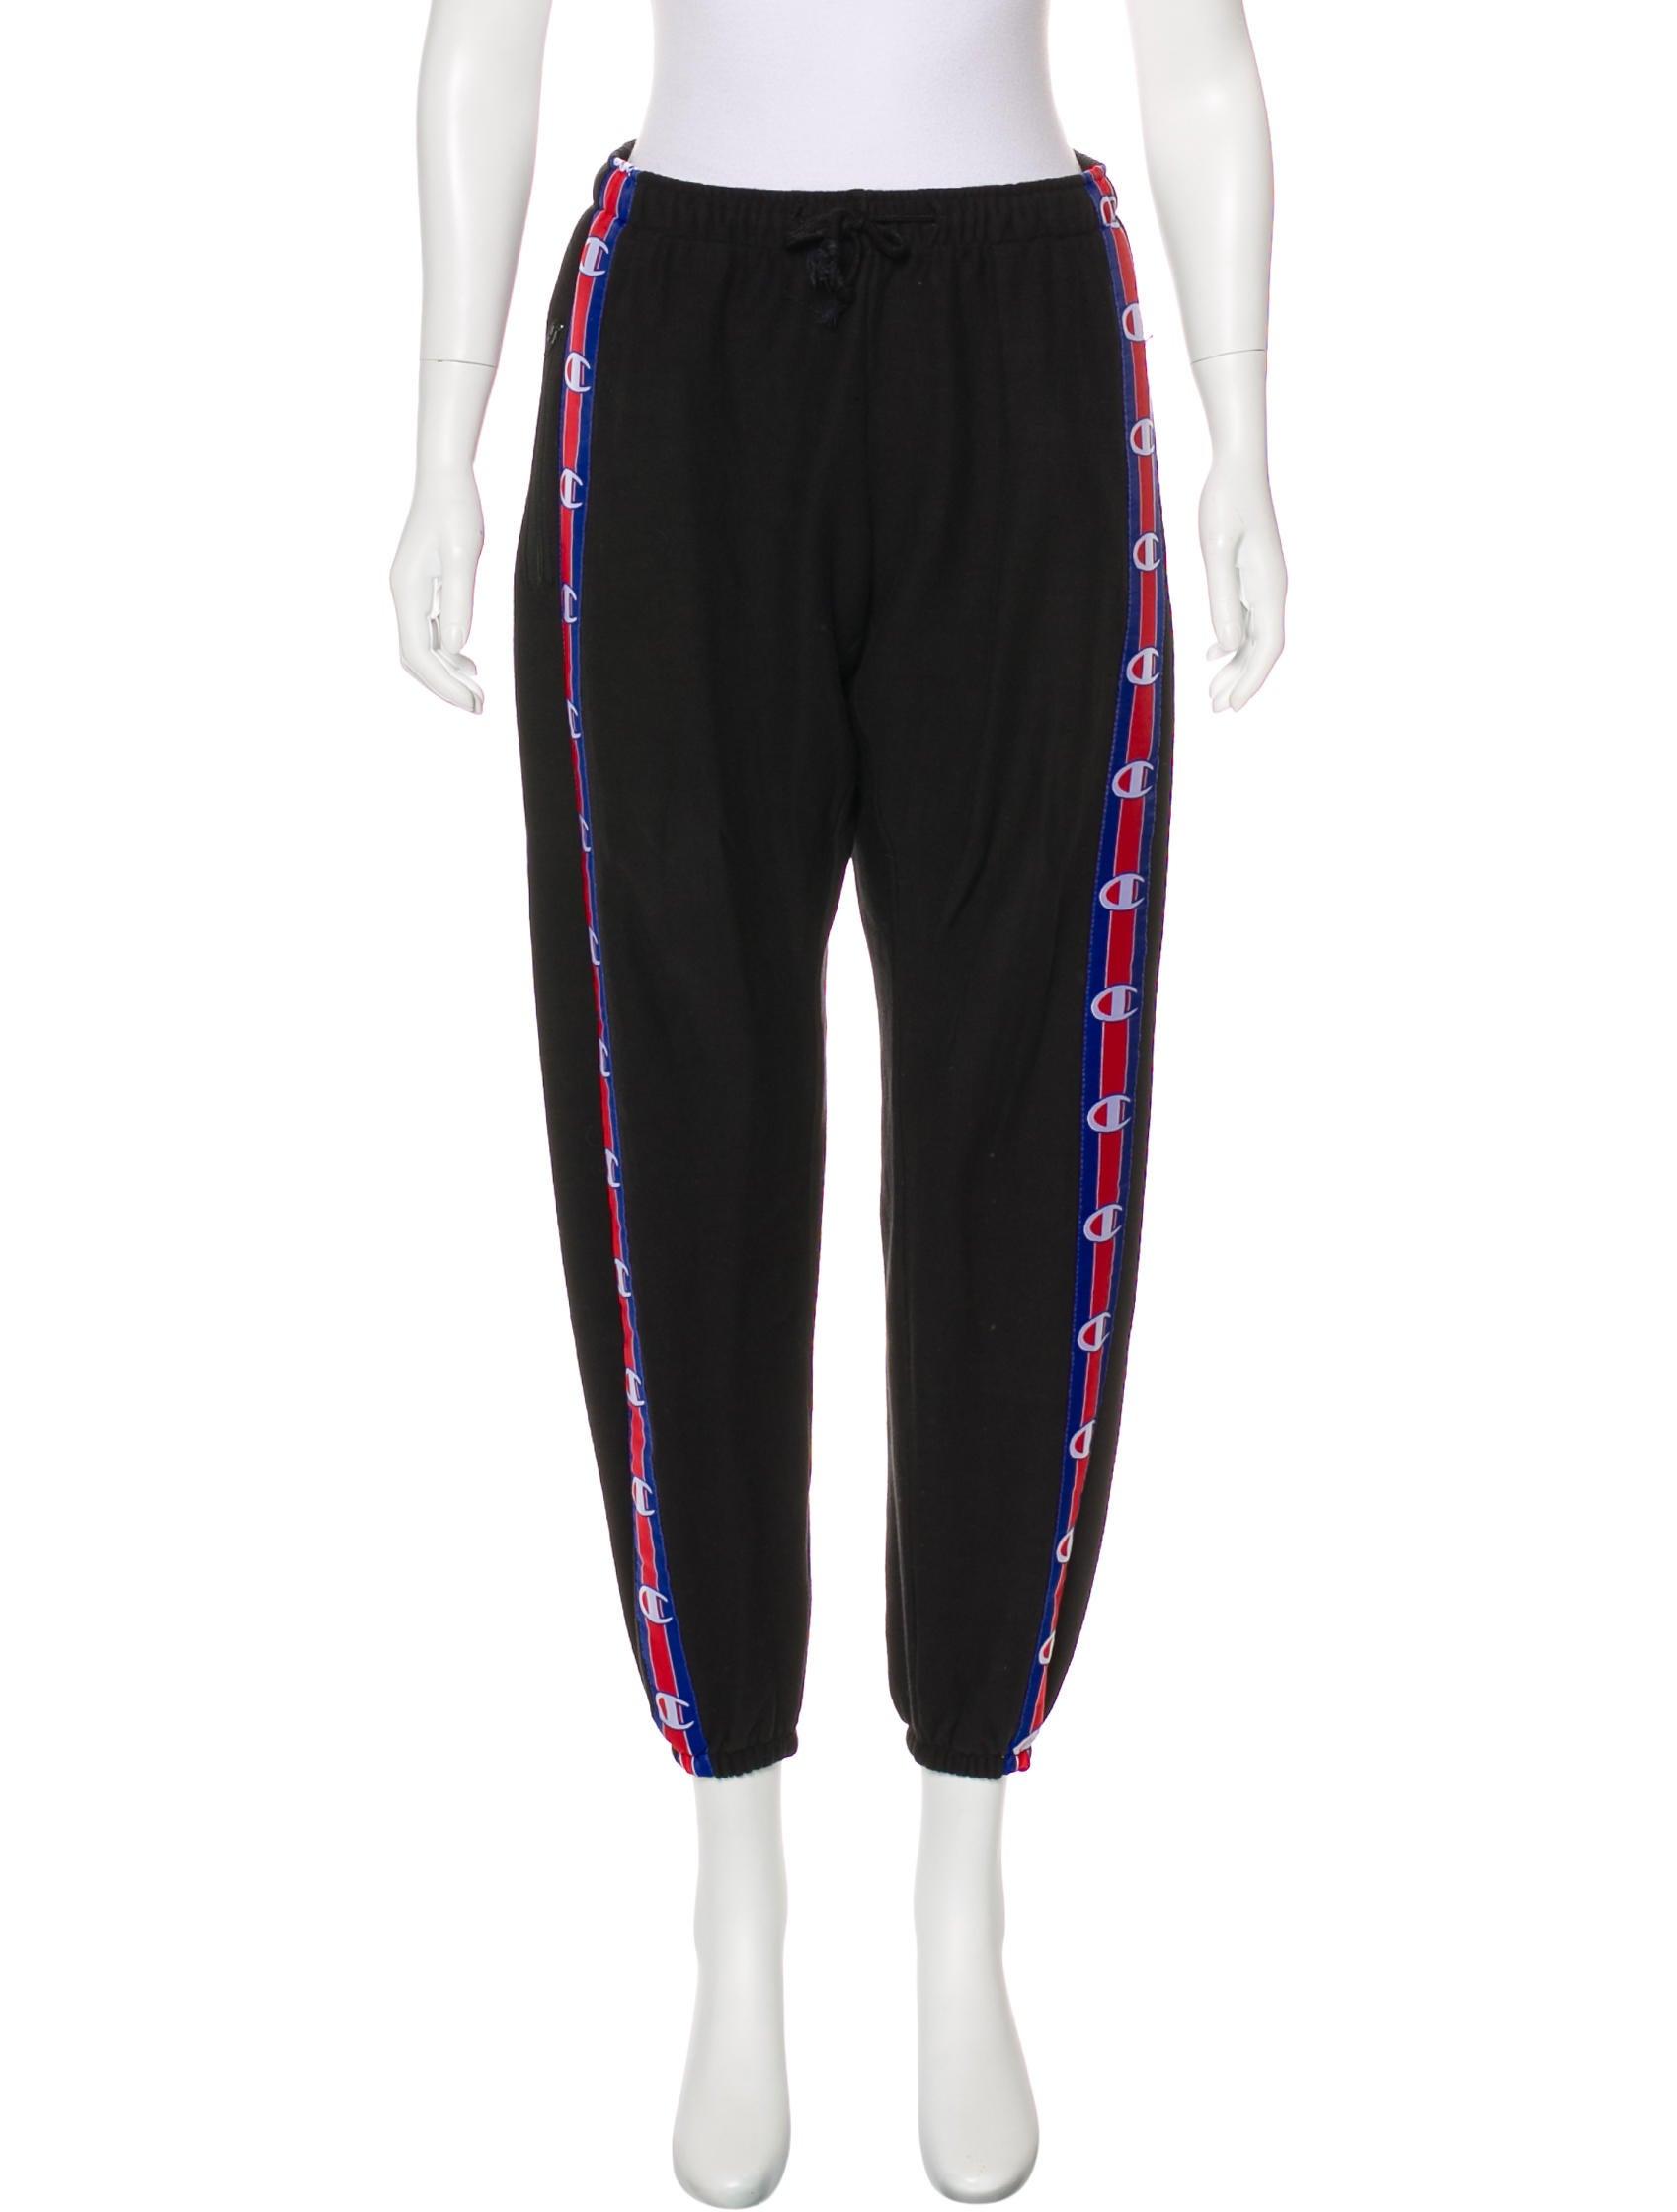 05ecb4a0ad5c4e Vetements x Champion 2017 Taped Sweatpants - Clothing - WCHVE20017 ...